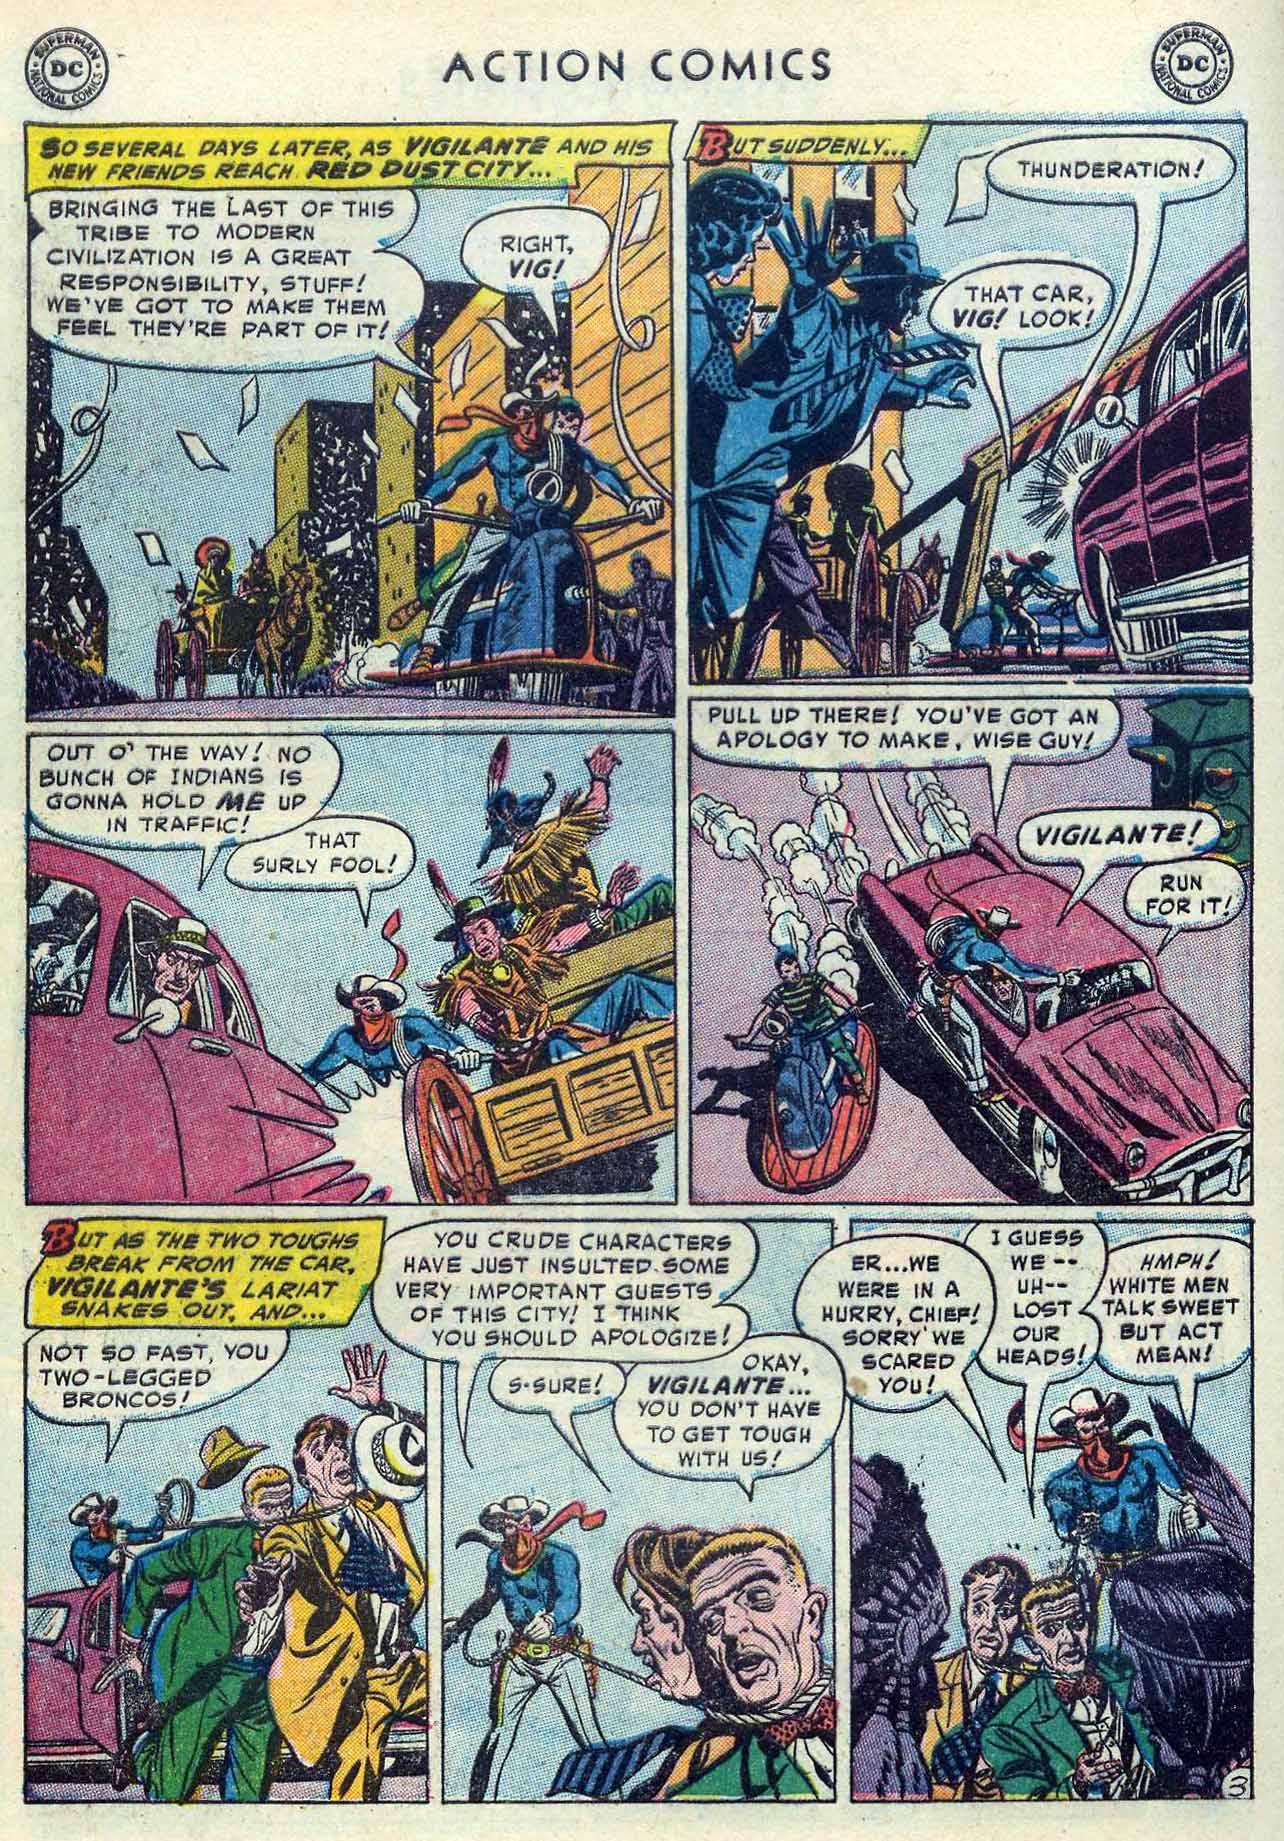 Action Comics (1938) 190 Page 35